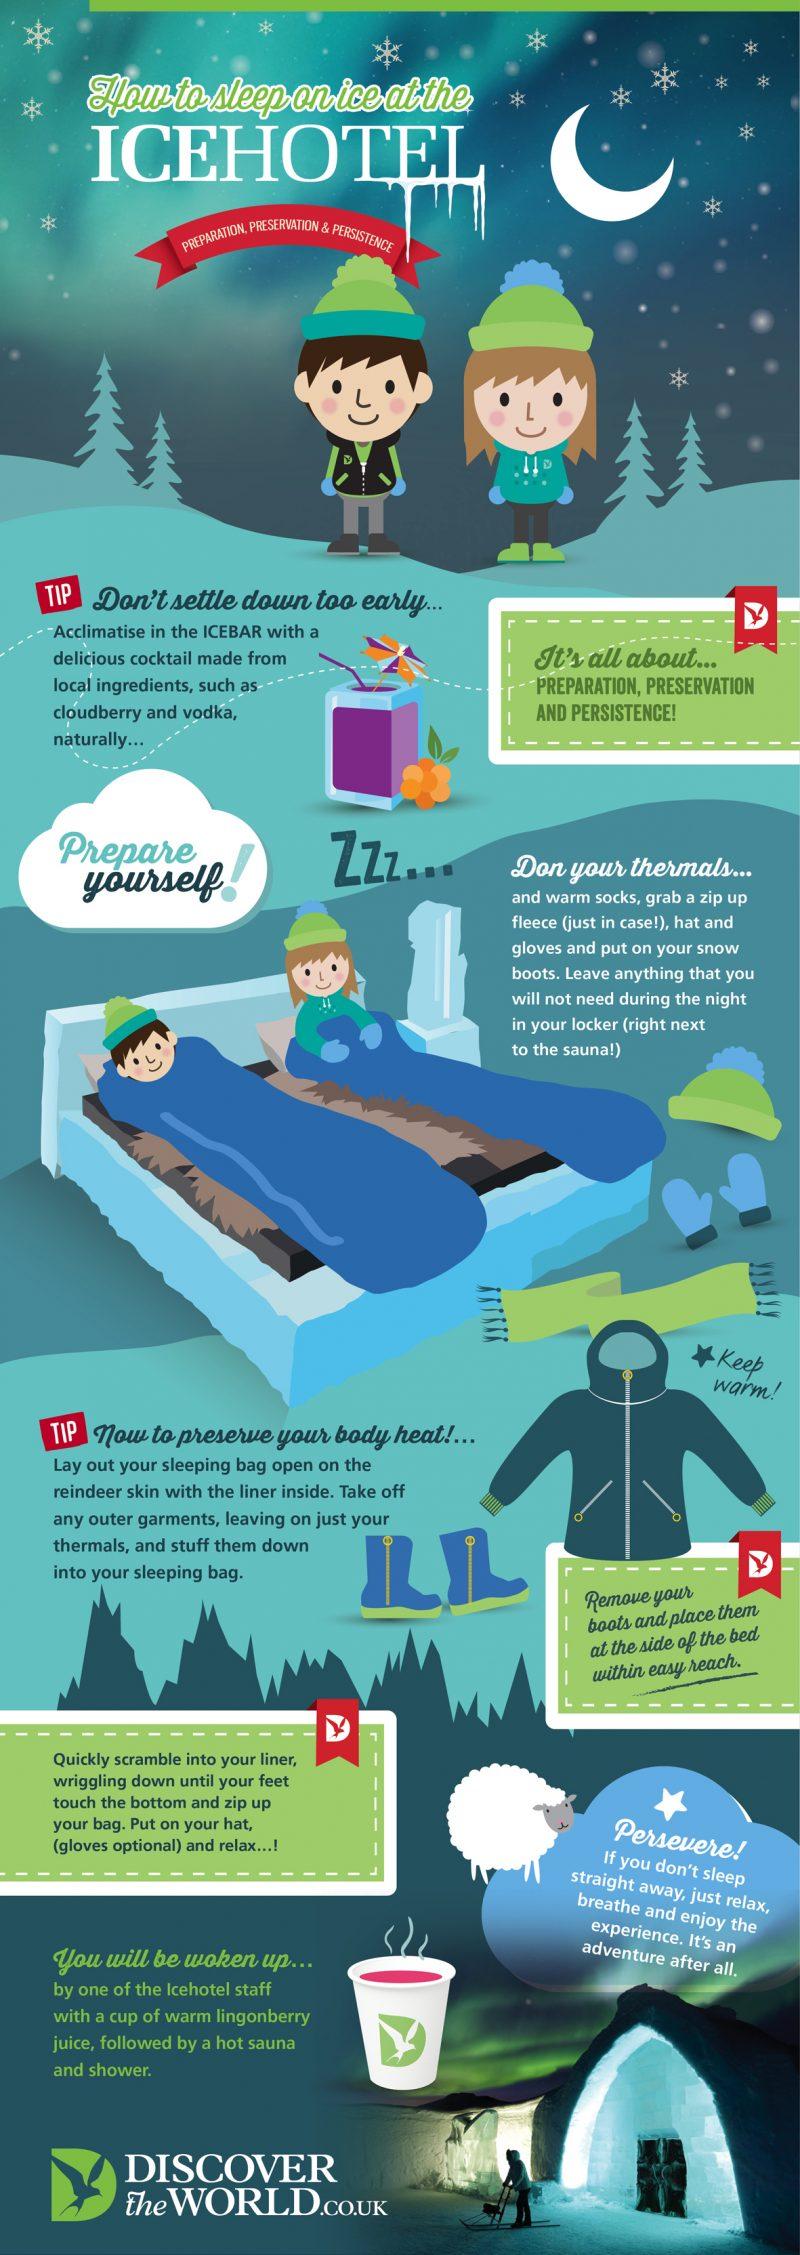 how to sleep on ice